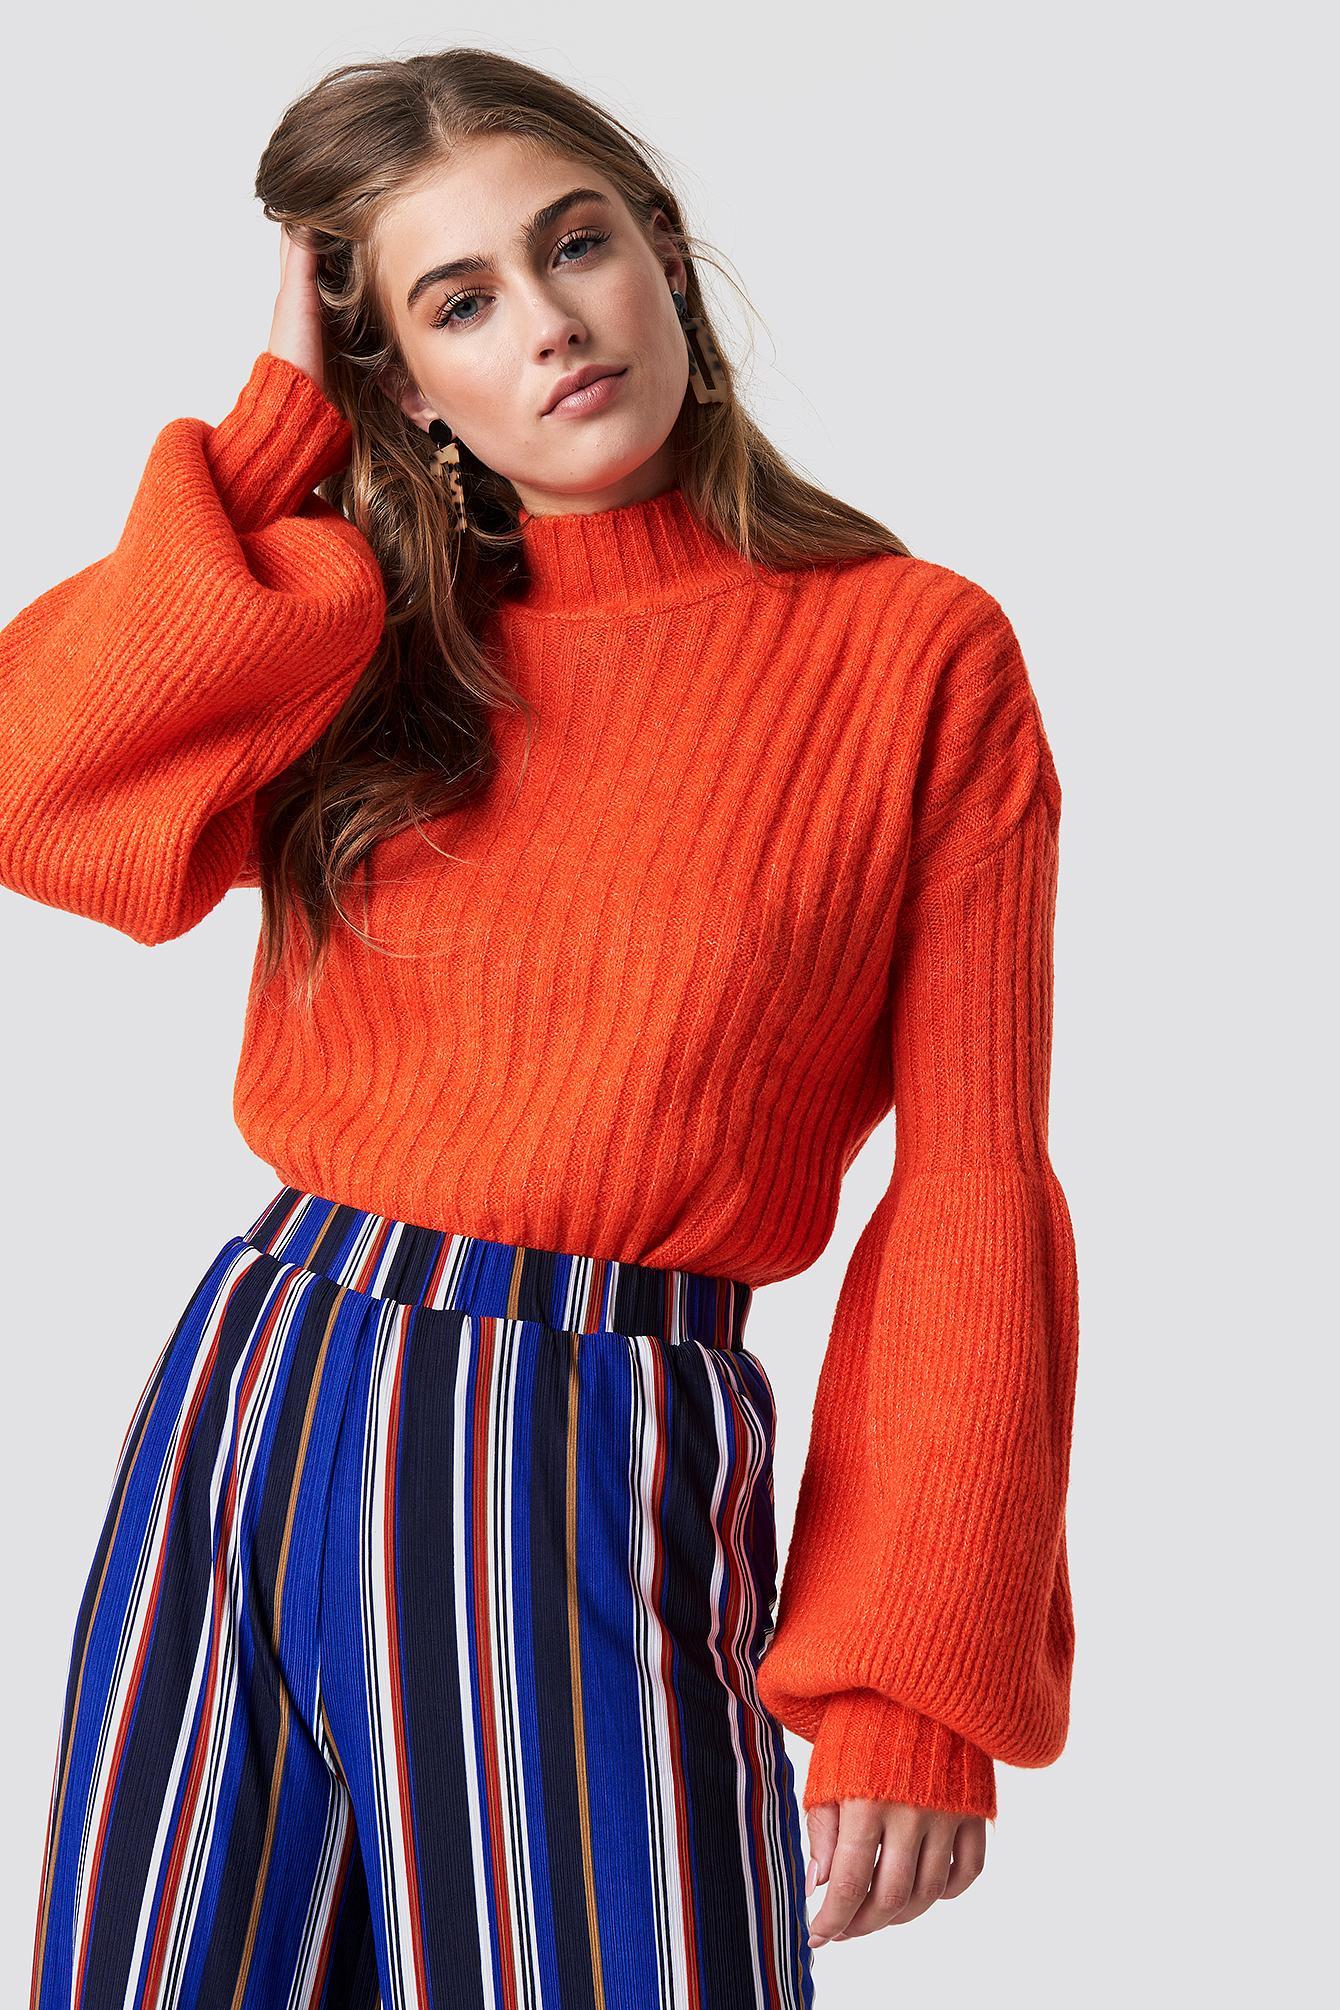 8166074e5f79a Balloon Sleeve Knitted Sweater - Orange